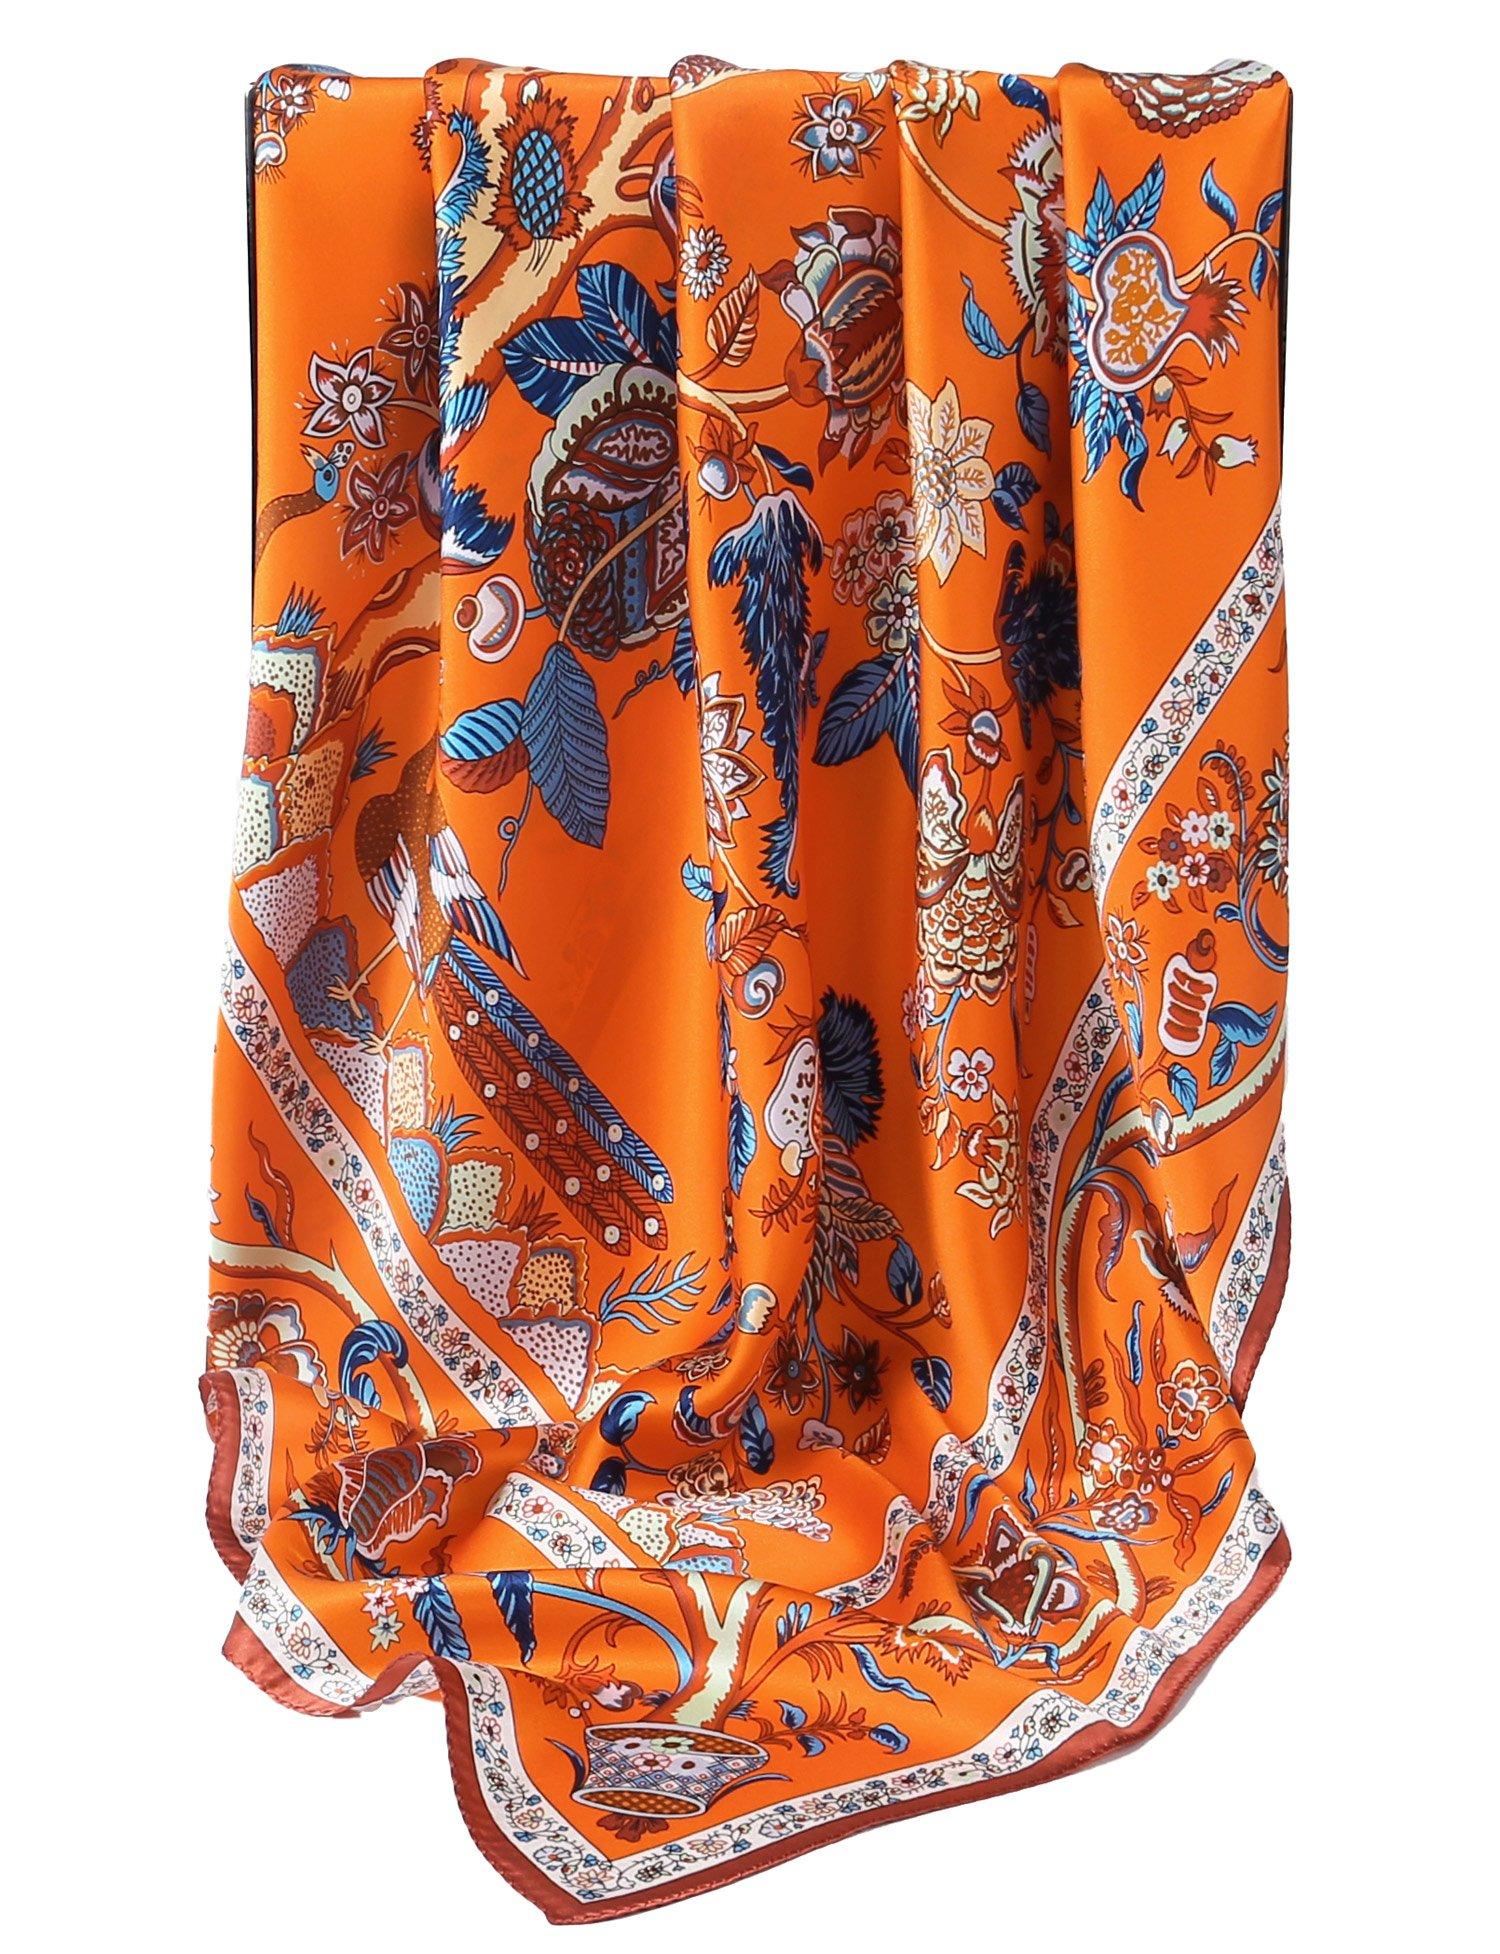 Grace Scarves 100% Silk Scarf, Extra-Large, Beanstalk, Orange by Grace Scarves